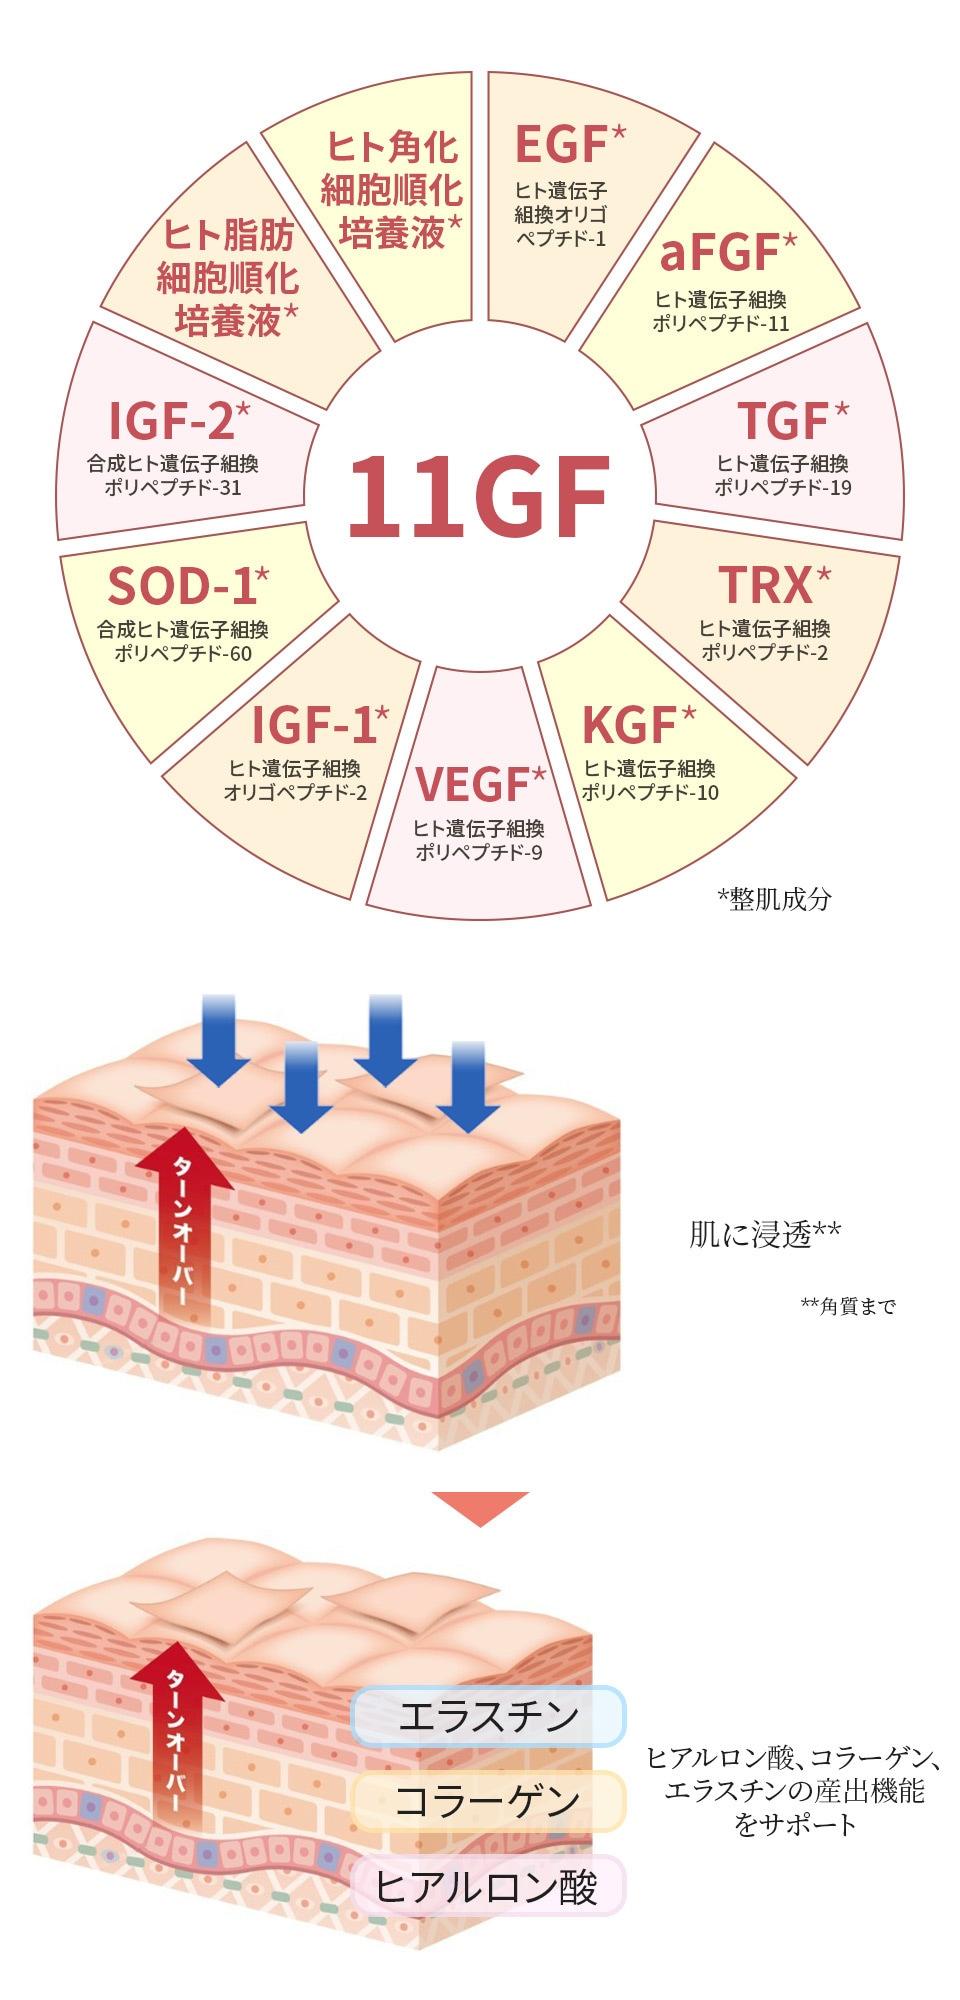 ヒト脂肪細胞順化培養液、ヒト角化細胞順化培養液配合高濃度ペプチド美容液